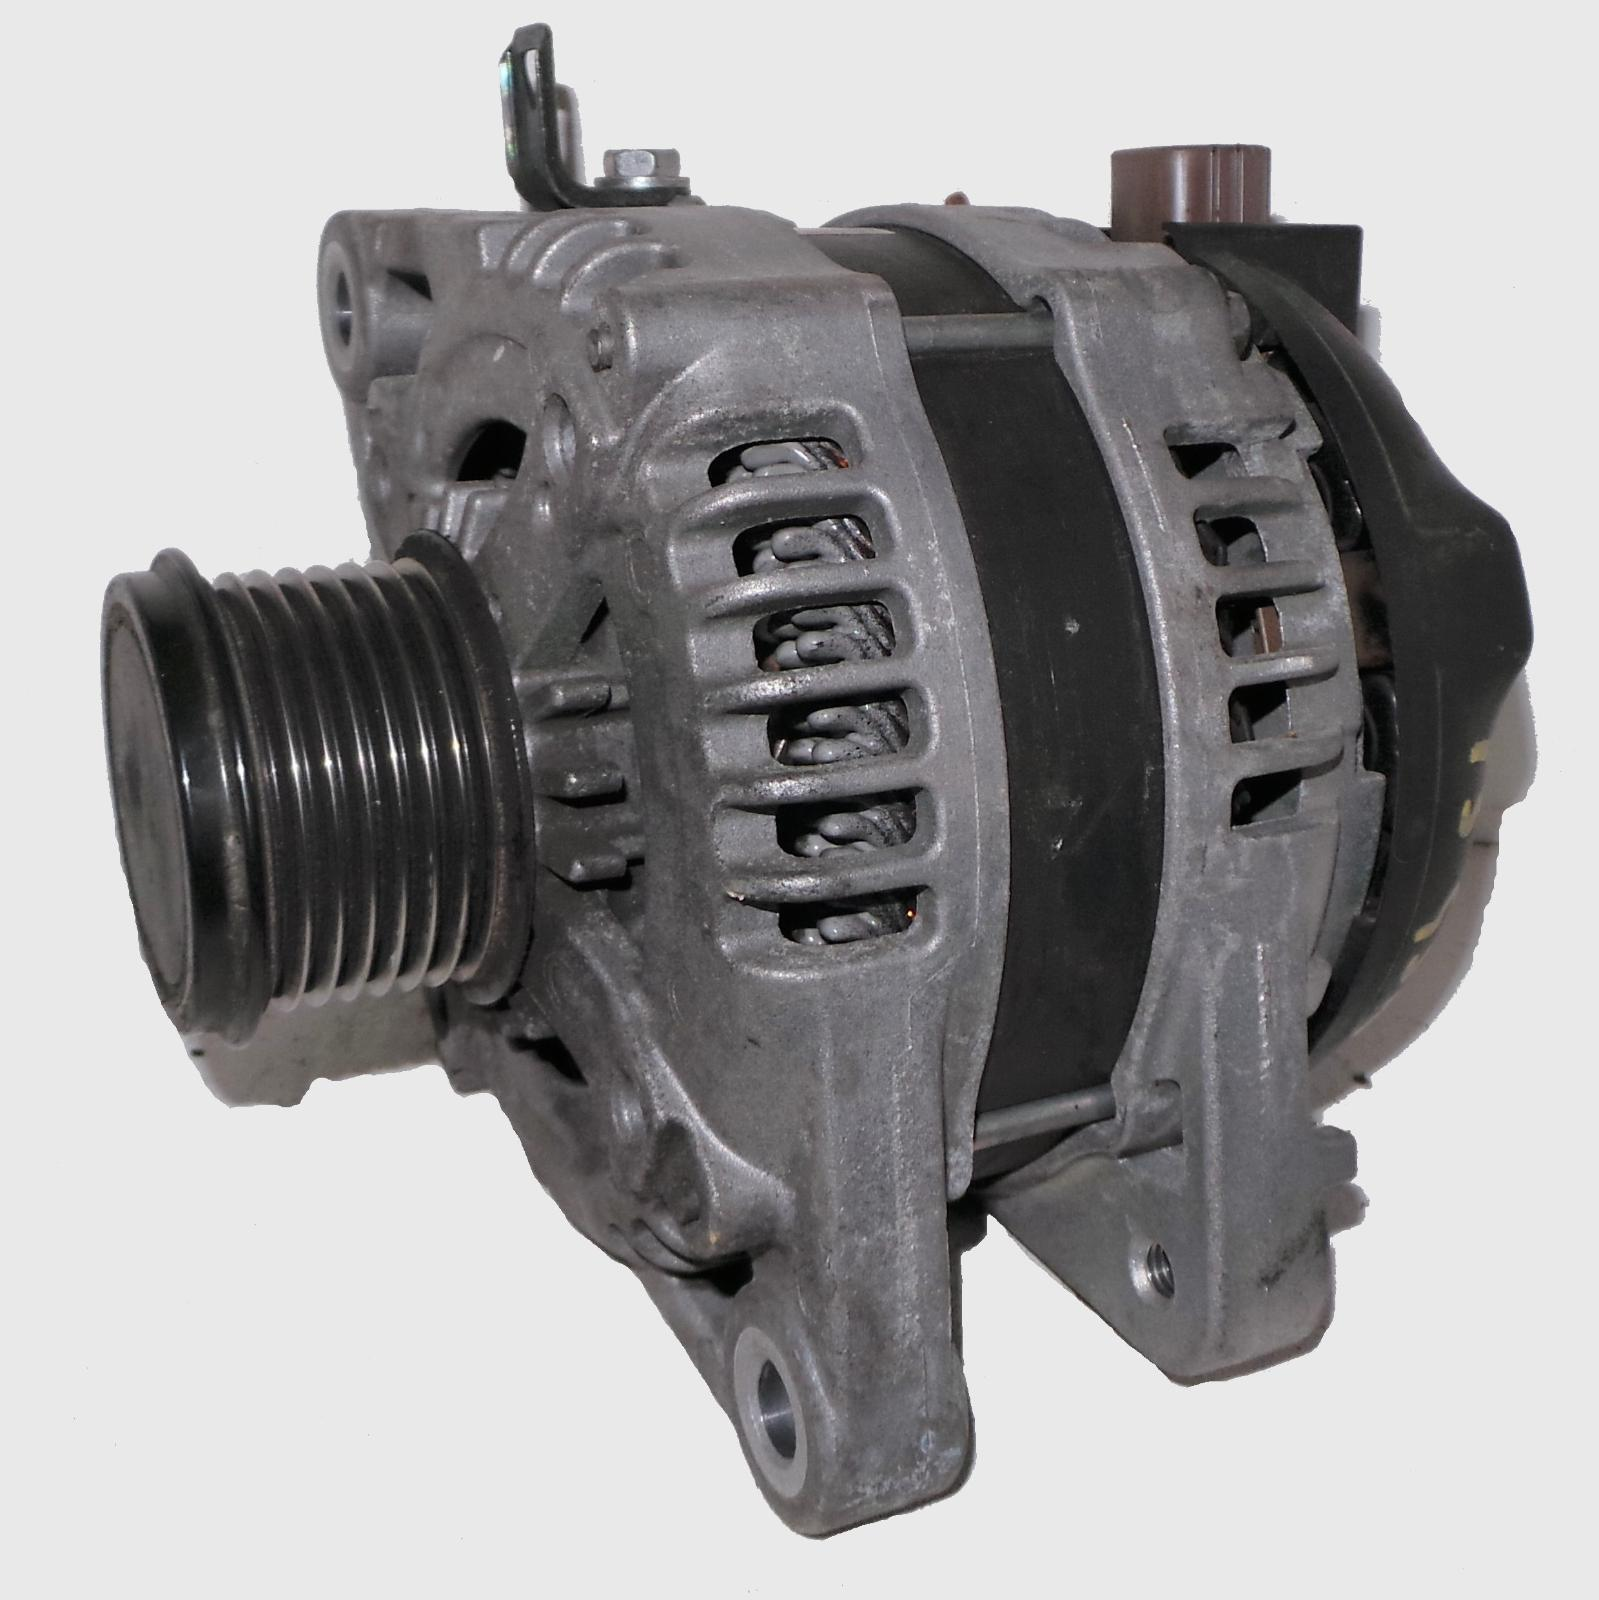 TOYOTA RAV4, Alternator, 3.5 V6, 2GR-FE, ACA33, 11/05-12/12